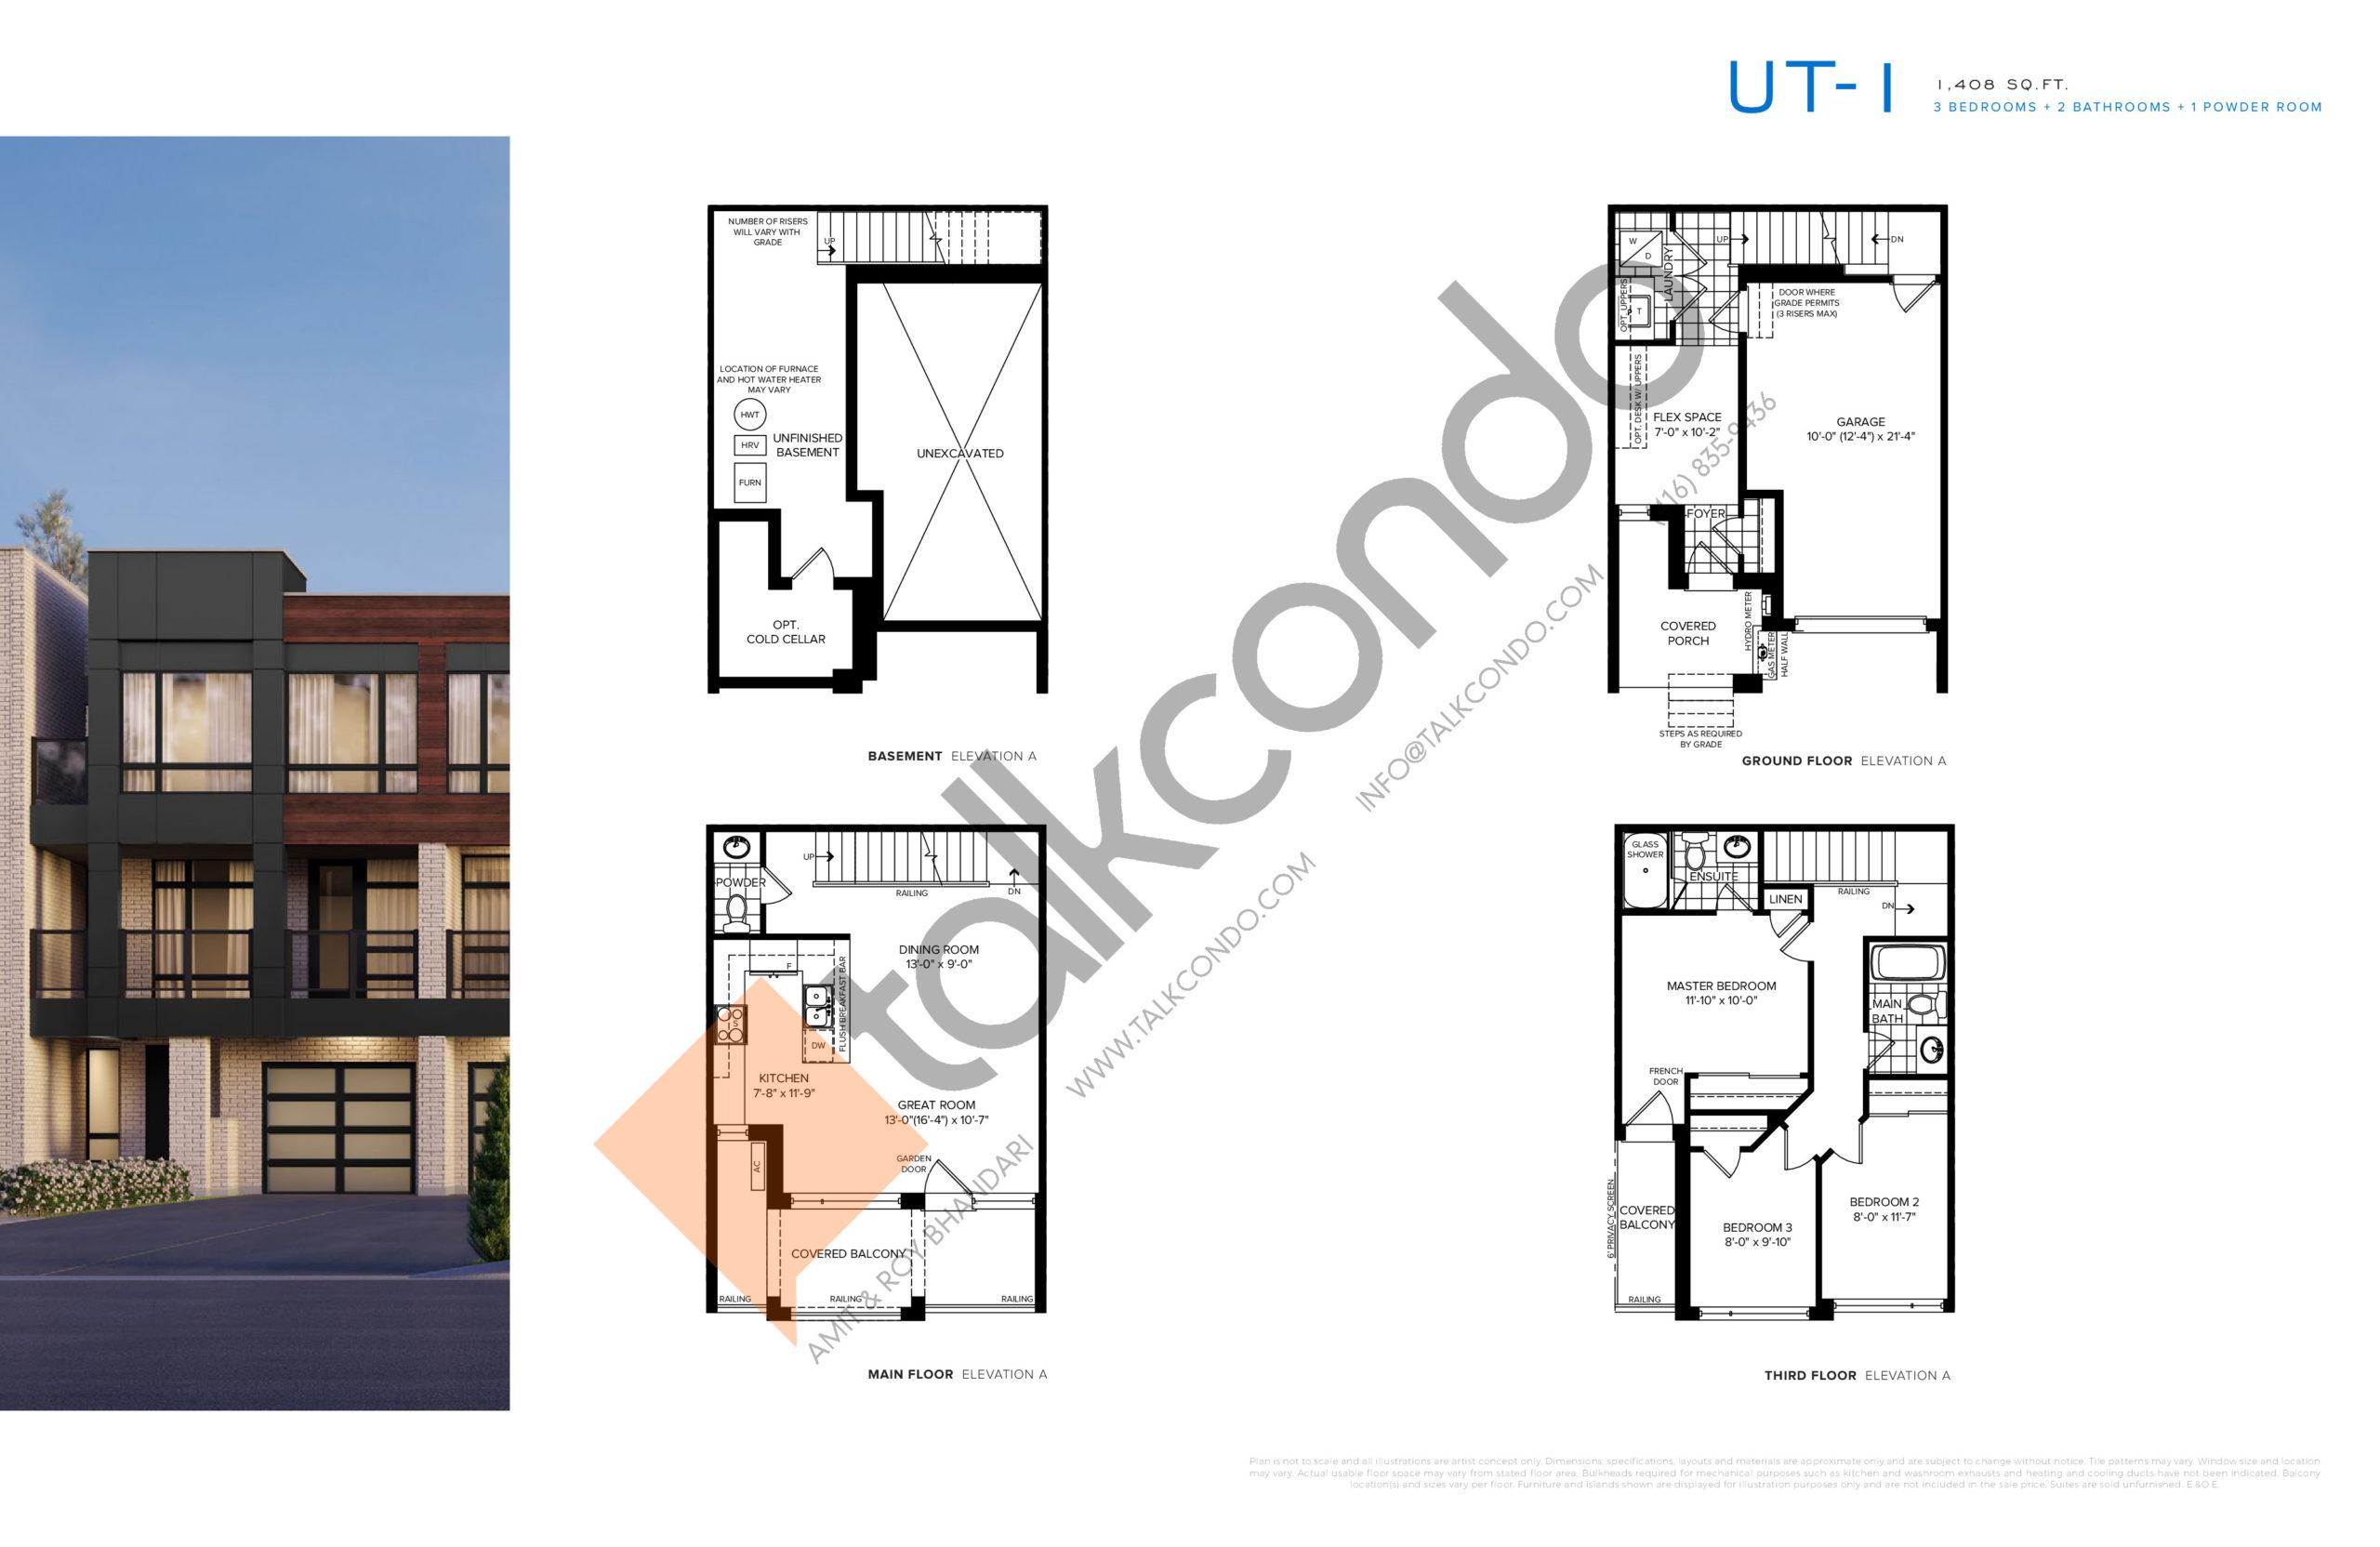 UT-1 Floor Plan at SXSW Ravine Towns - 1408 sq.ft